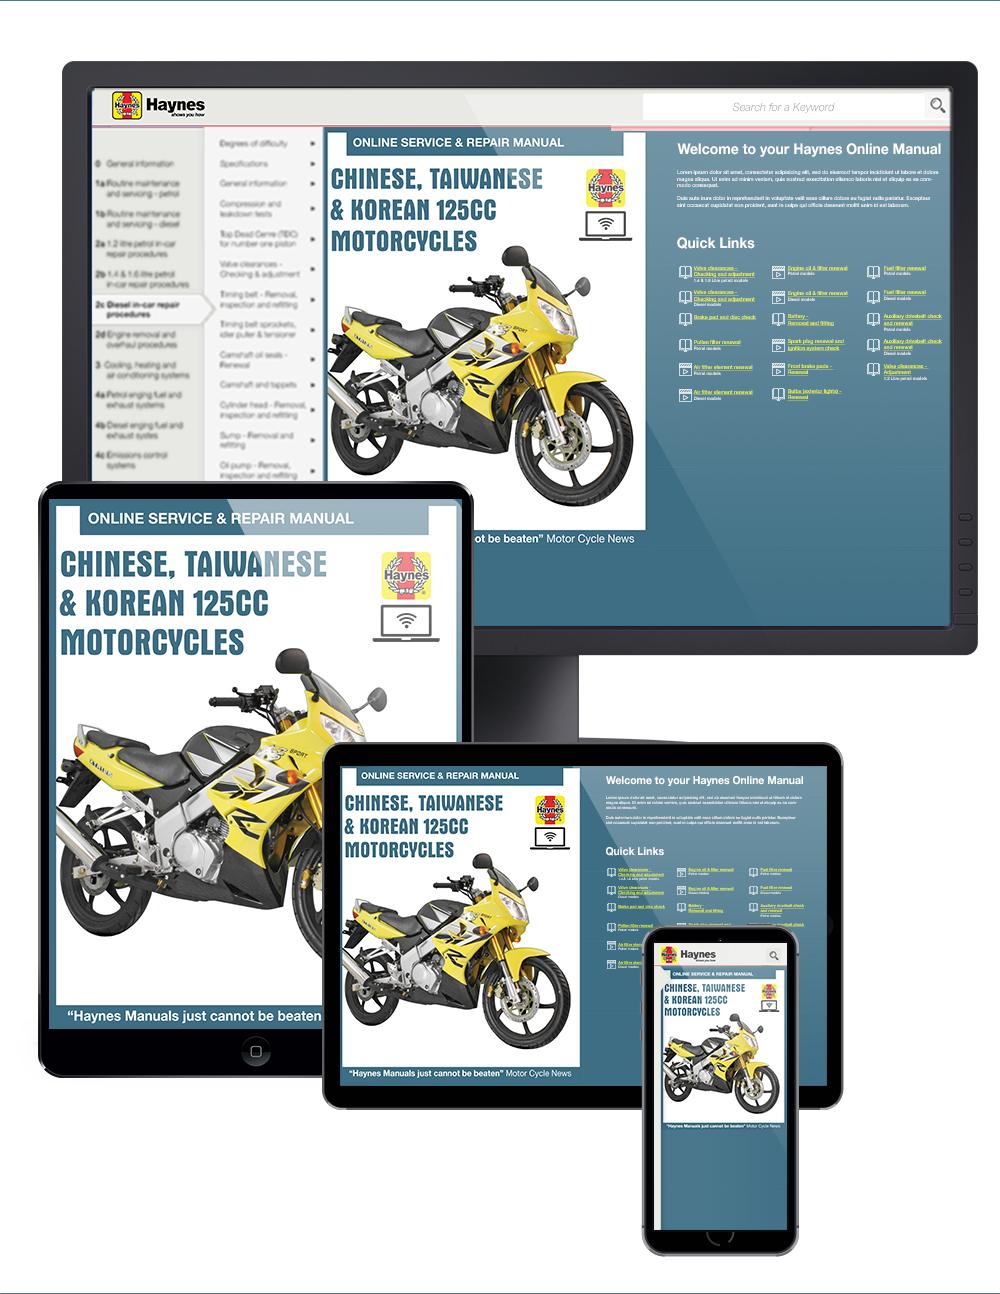 Chinese, Taiwanese & Korean 125cc Motorcycles Haynes Online Manual